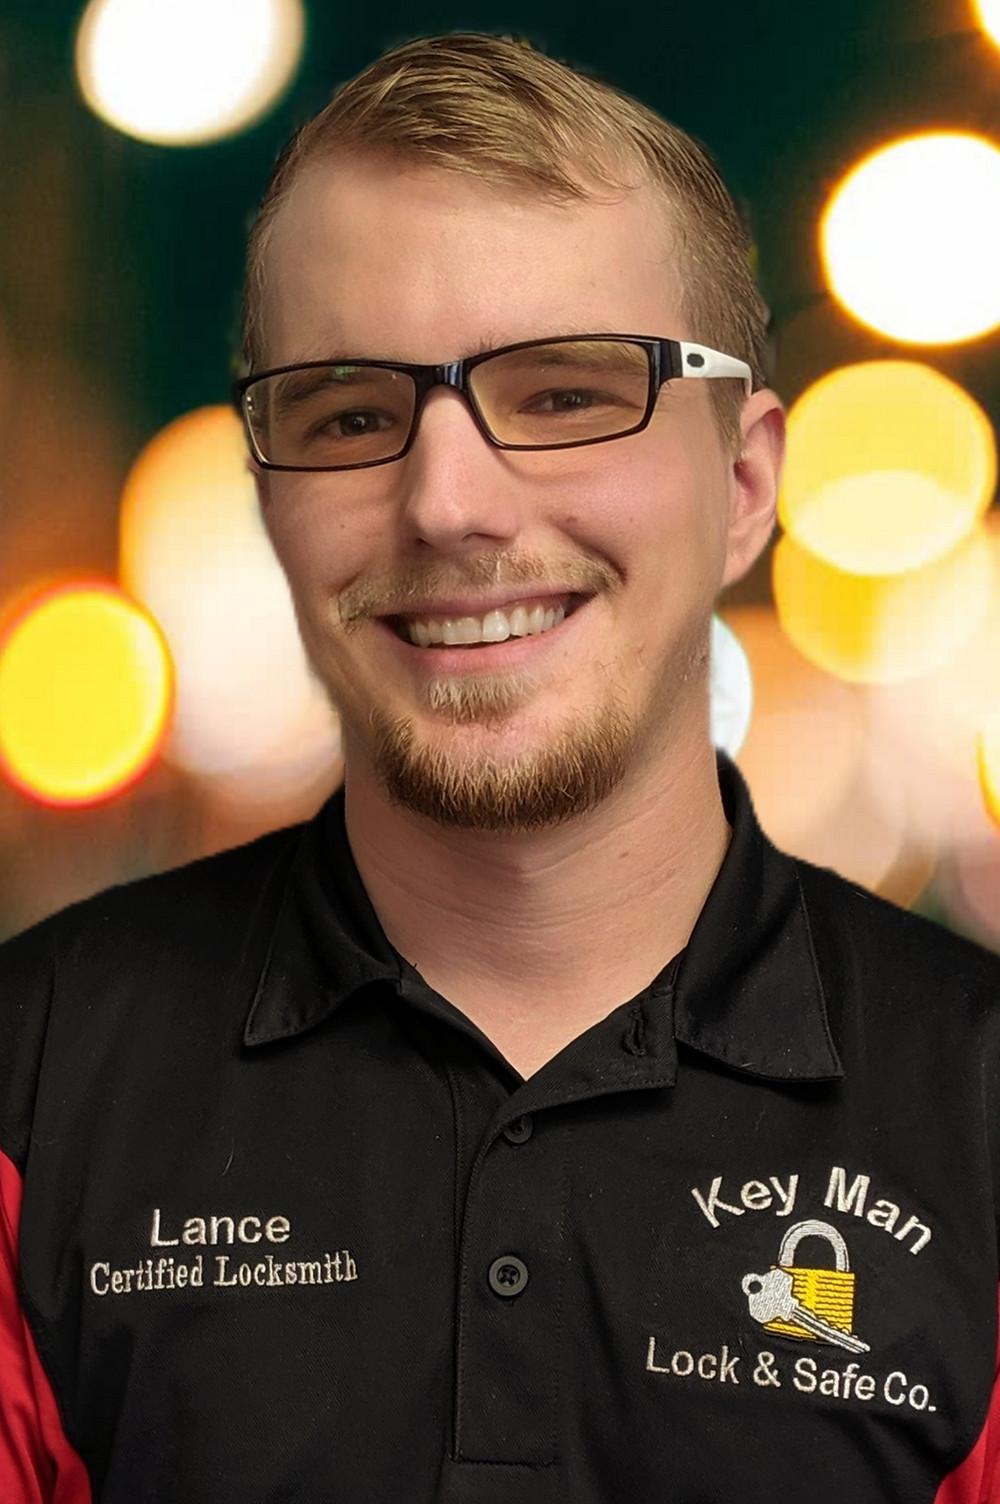 Lance Letteer, Master Locksmith Key Man   Lock & Safe Company